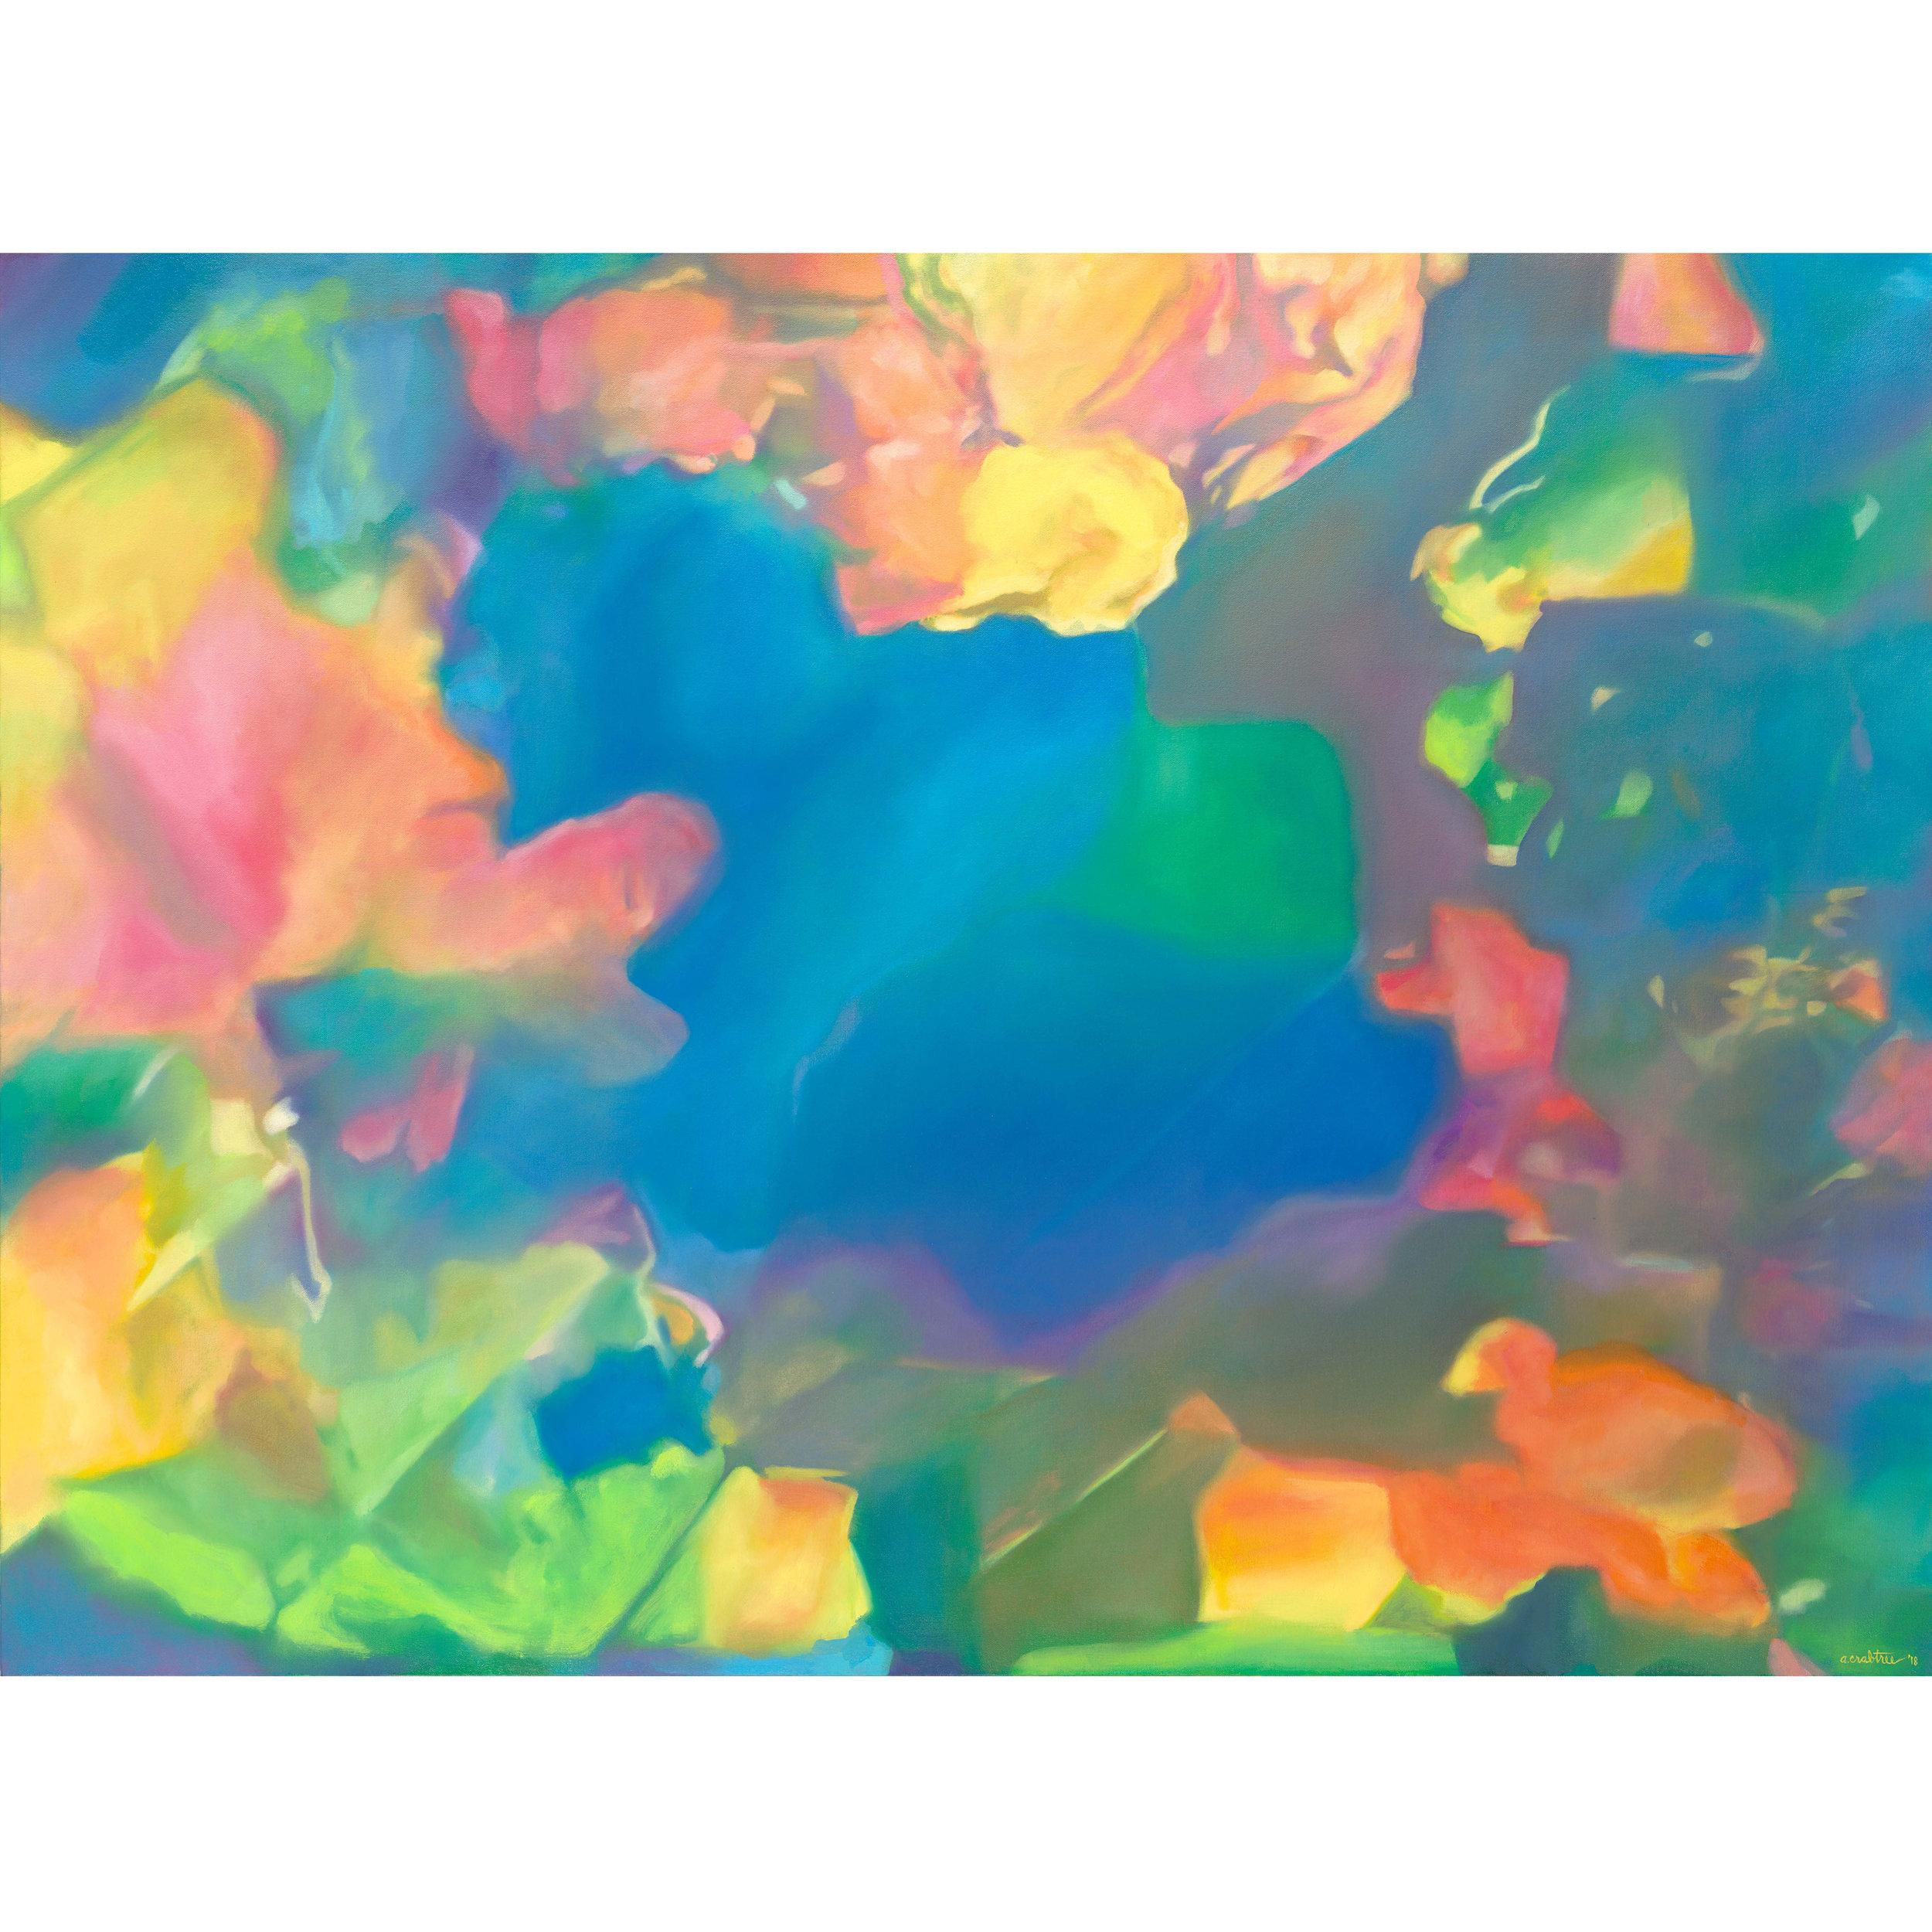 - SKYEblack opaloil on panel36 x 48 in2019